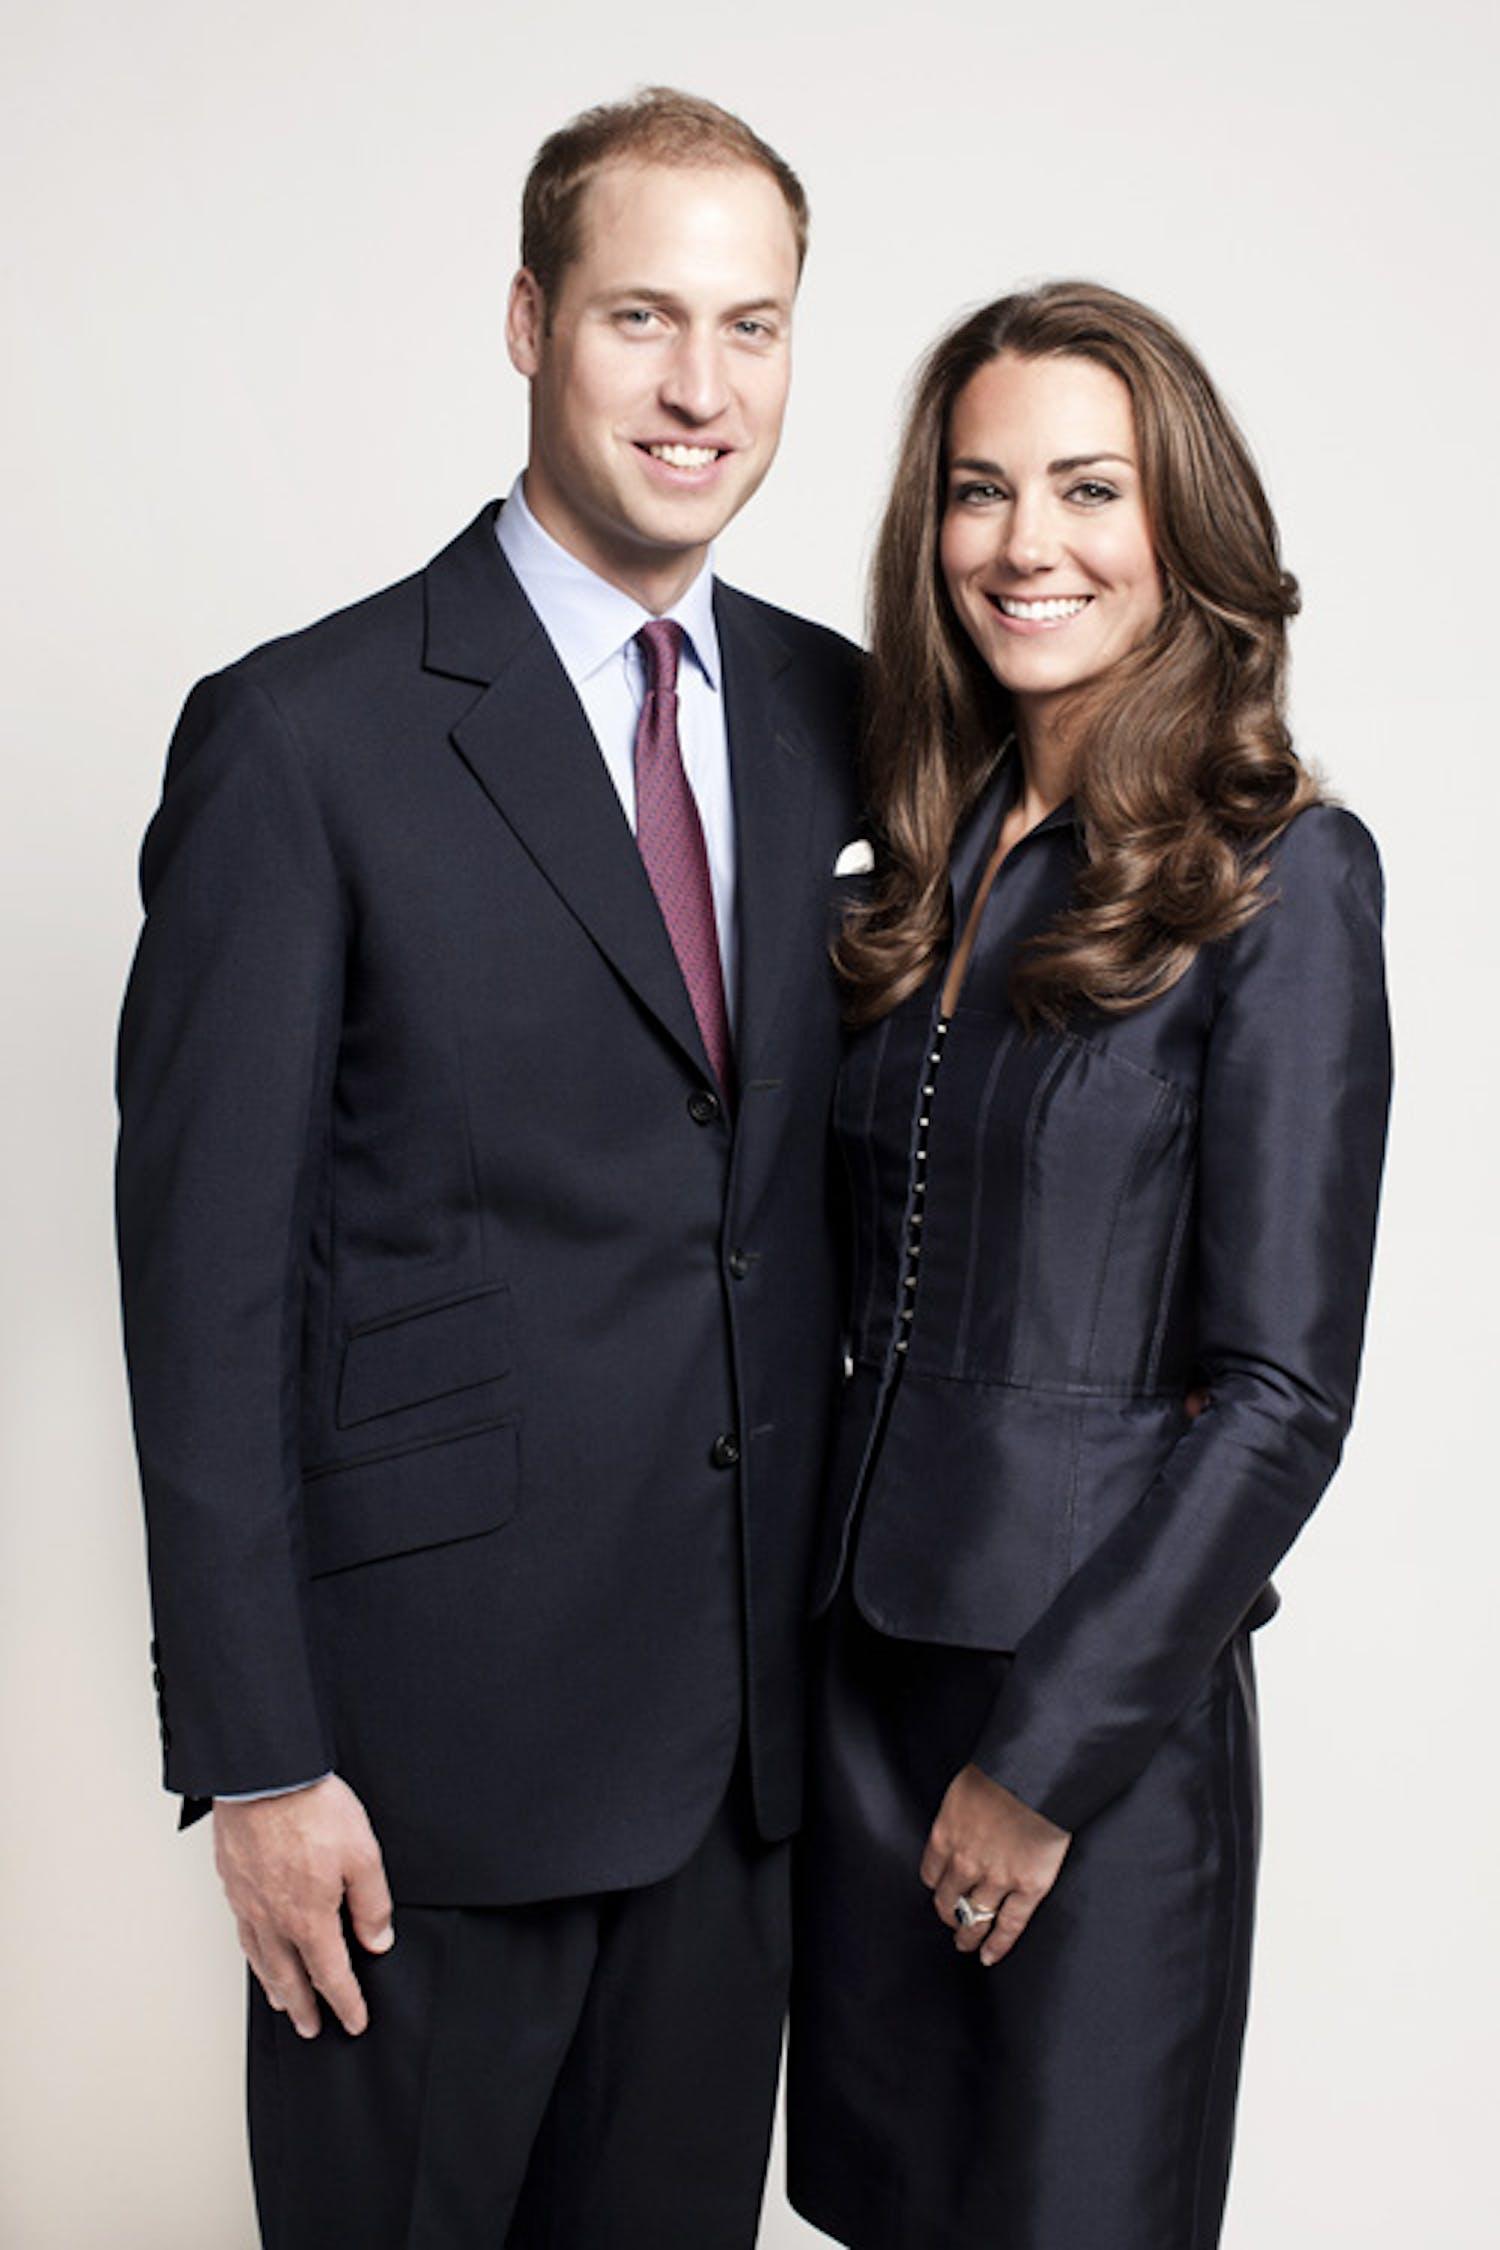 Il principe William e la moglie Kate Middleton - ©St. James's Palace by Chris Jackson/Getty